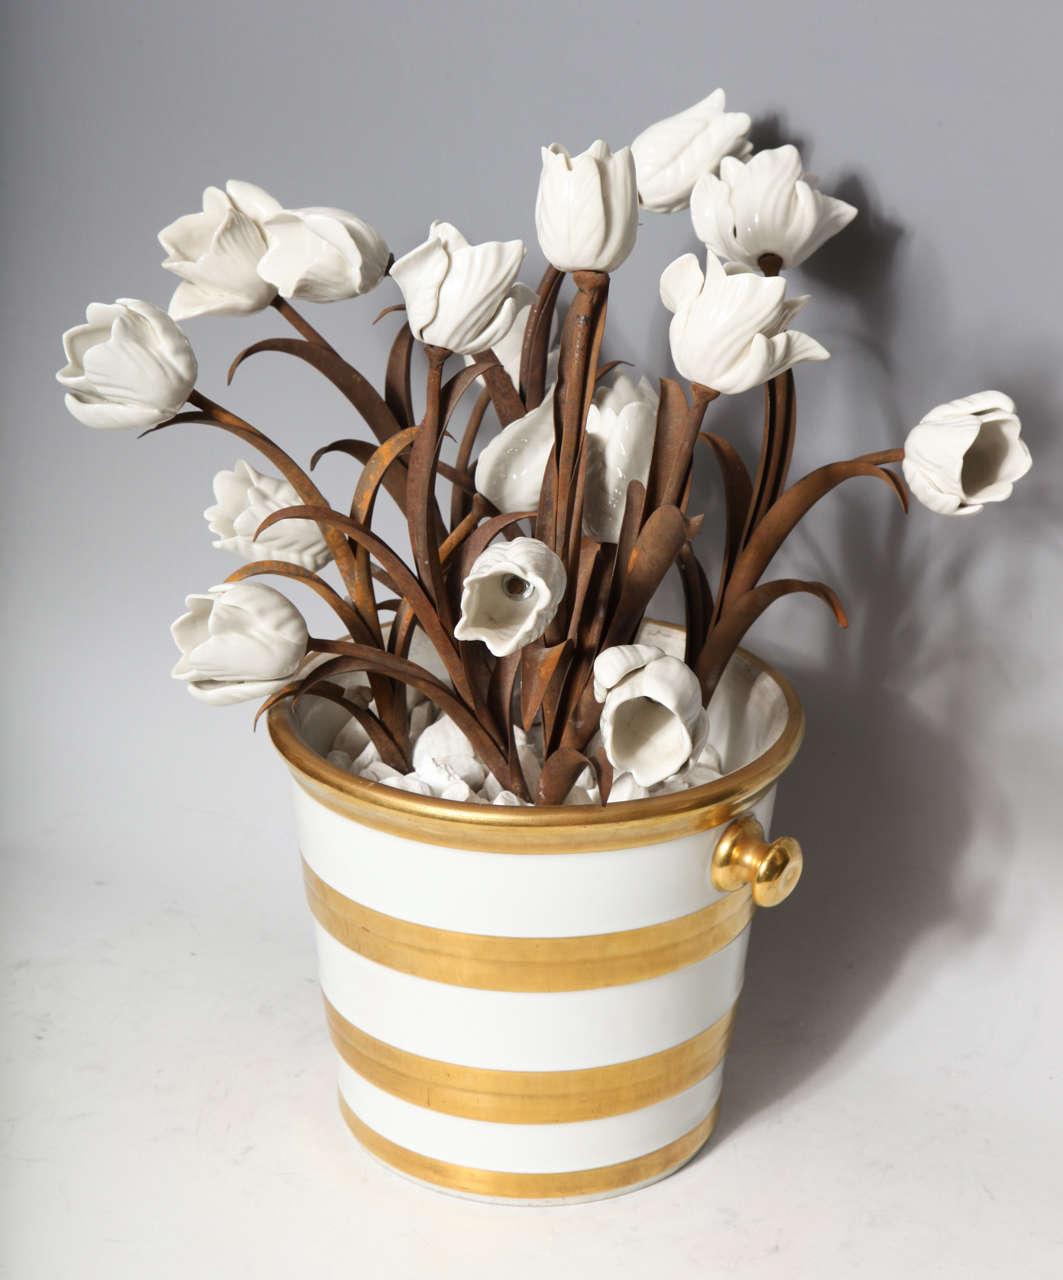 Unusual Pair of Antique French Louis XVI Style Porcelain Flower Baskets, Jansen For Sale 3